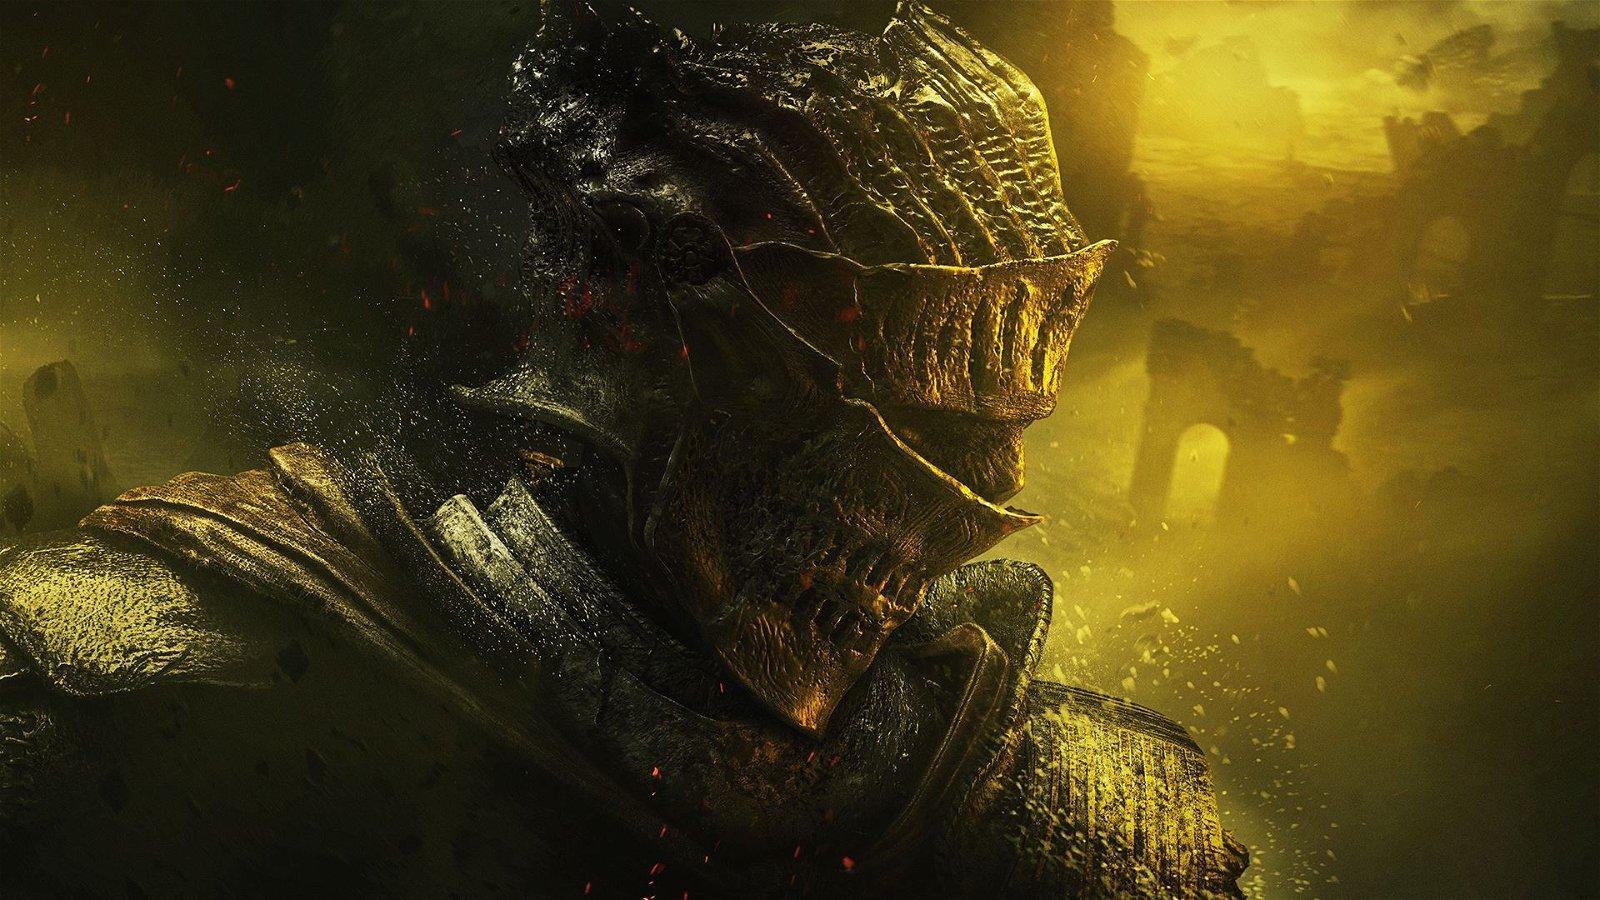 Dark Souls 3 PlayStation 4 Review